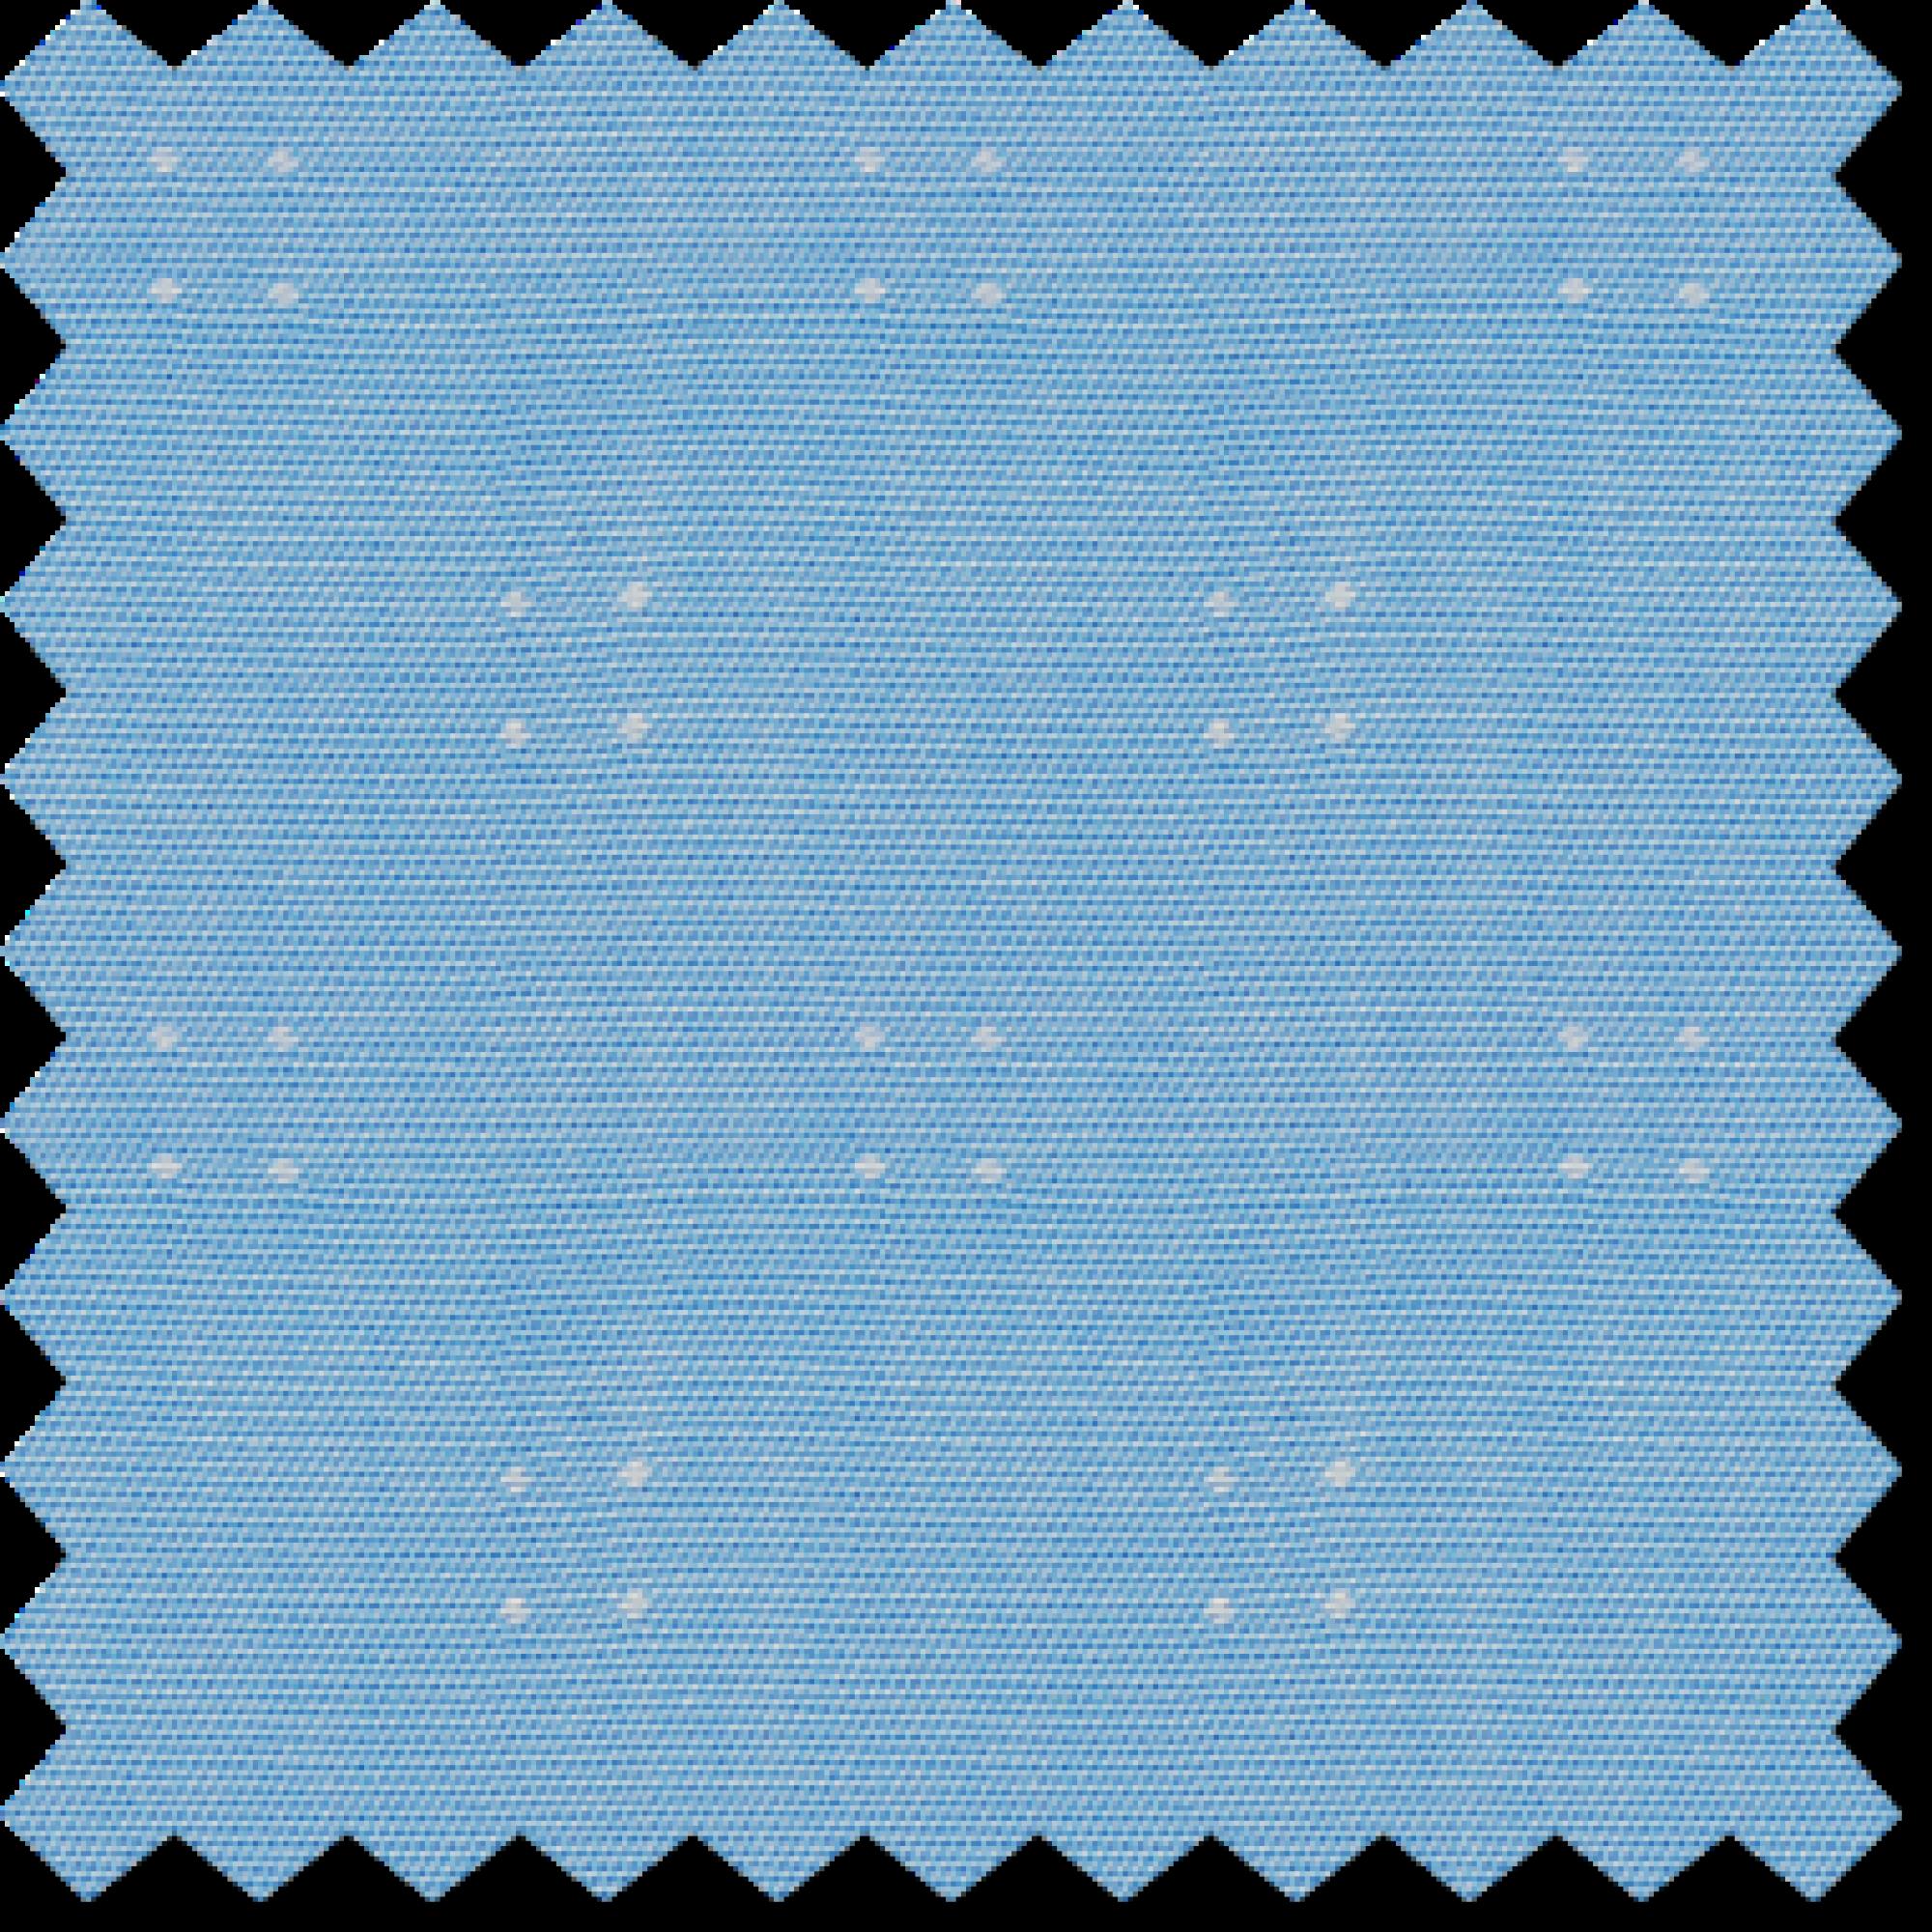 Land Mark 0407